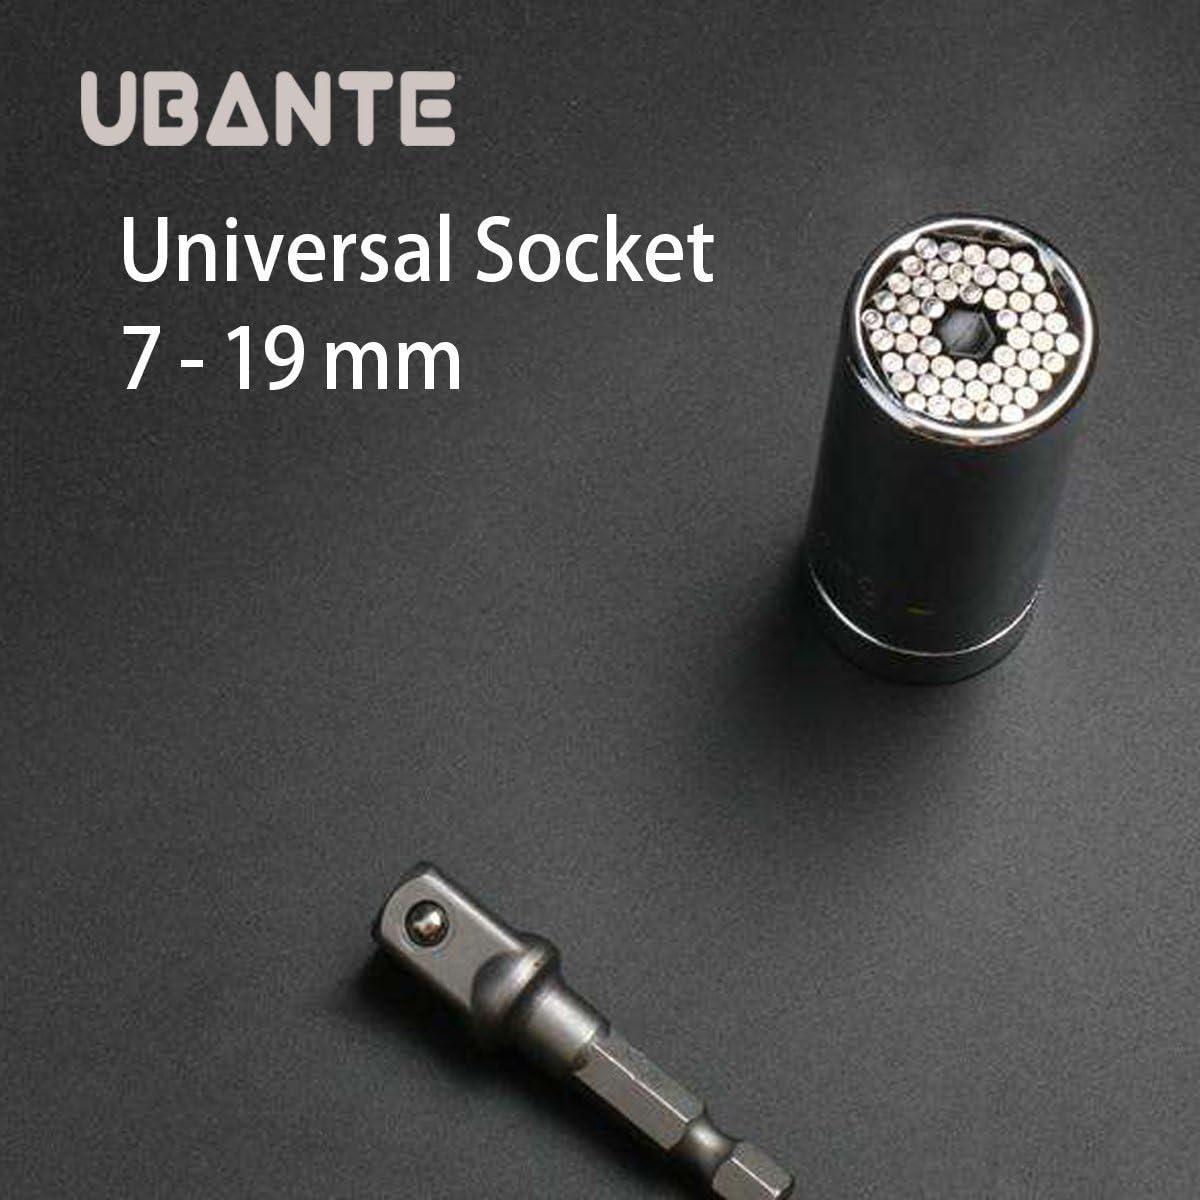 7mm-19mm UBANTE Universal Socket Multifunctional 1//4/'/'-3//4/'/' Universal Sockets Metric Wrench Power Drill Adapter Socket Professional Repair Tools